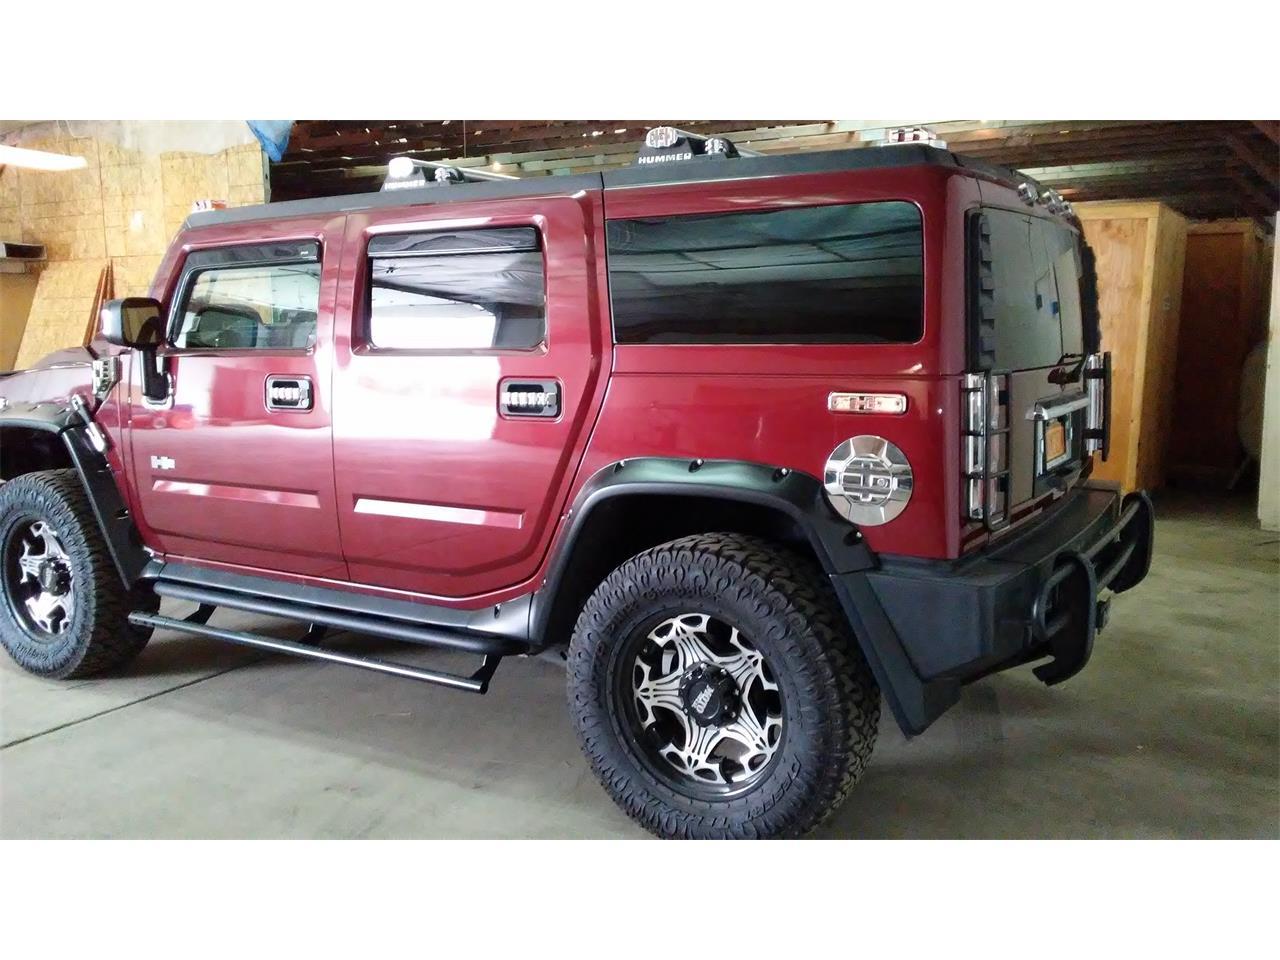 2004 Hummer H2 Urban Assault Vehicle for Sale ...